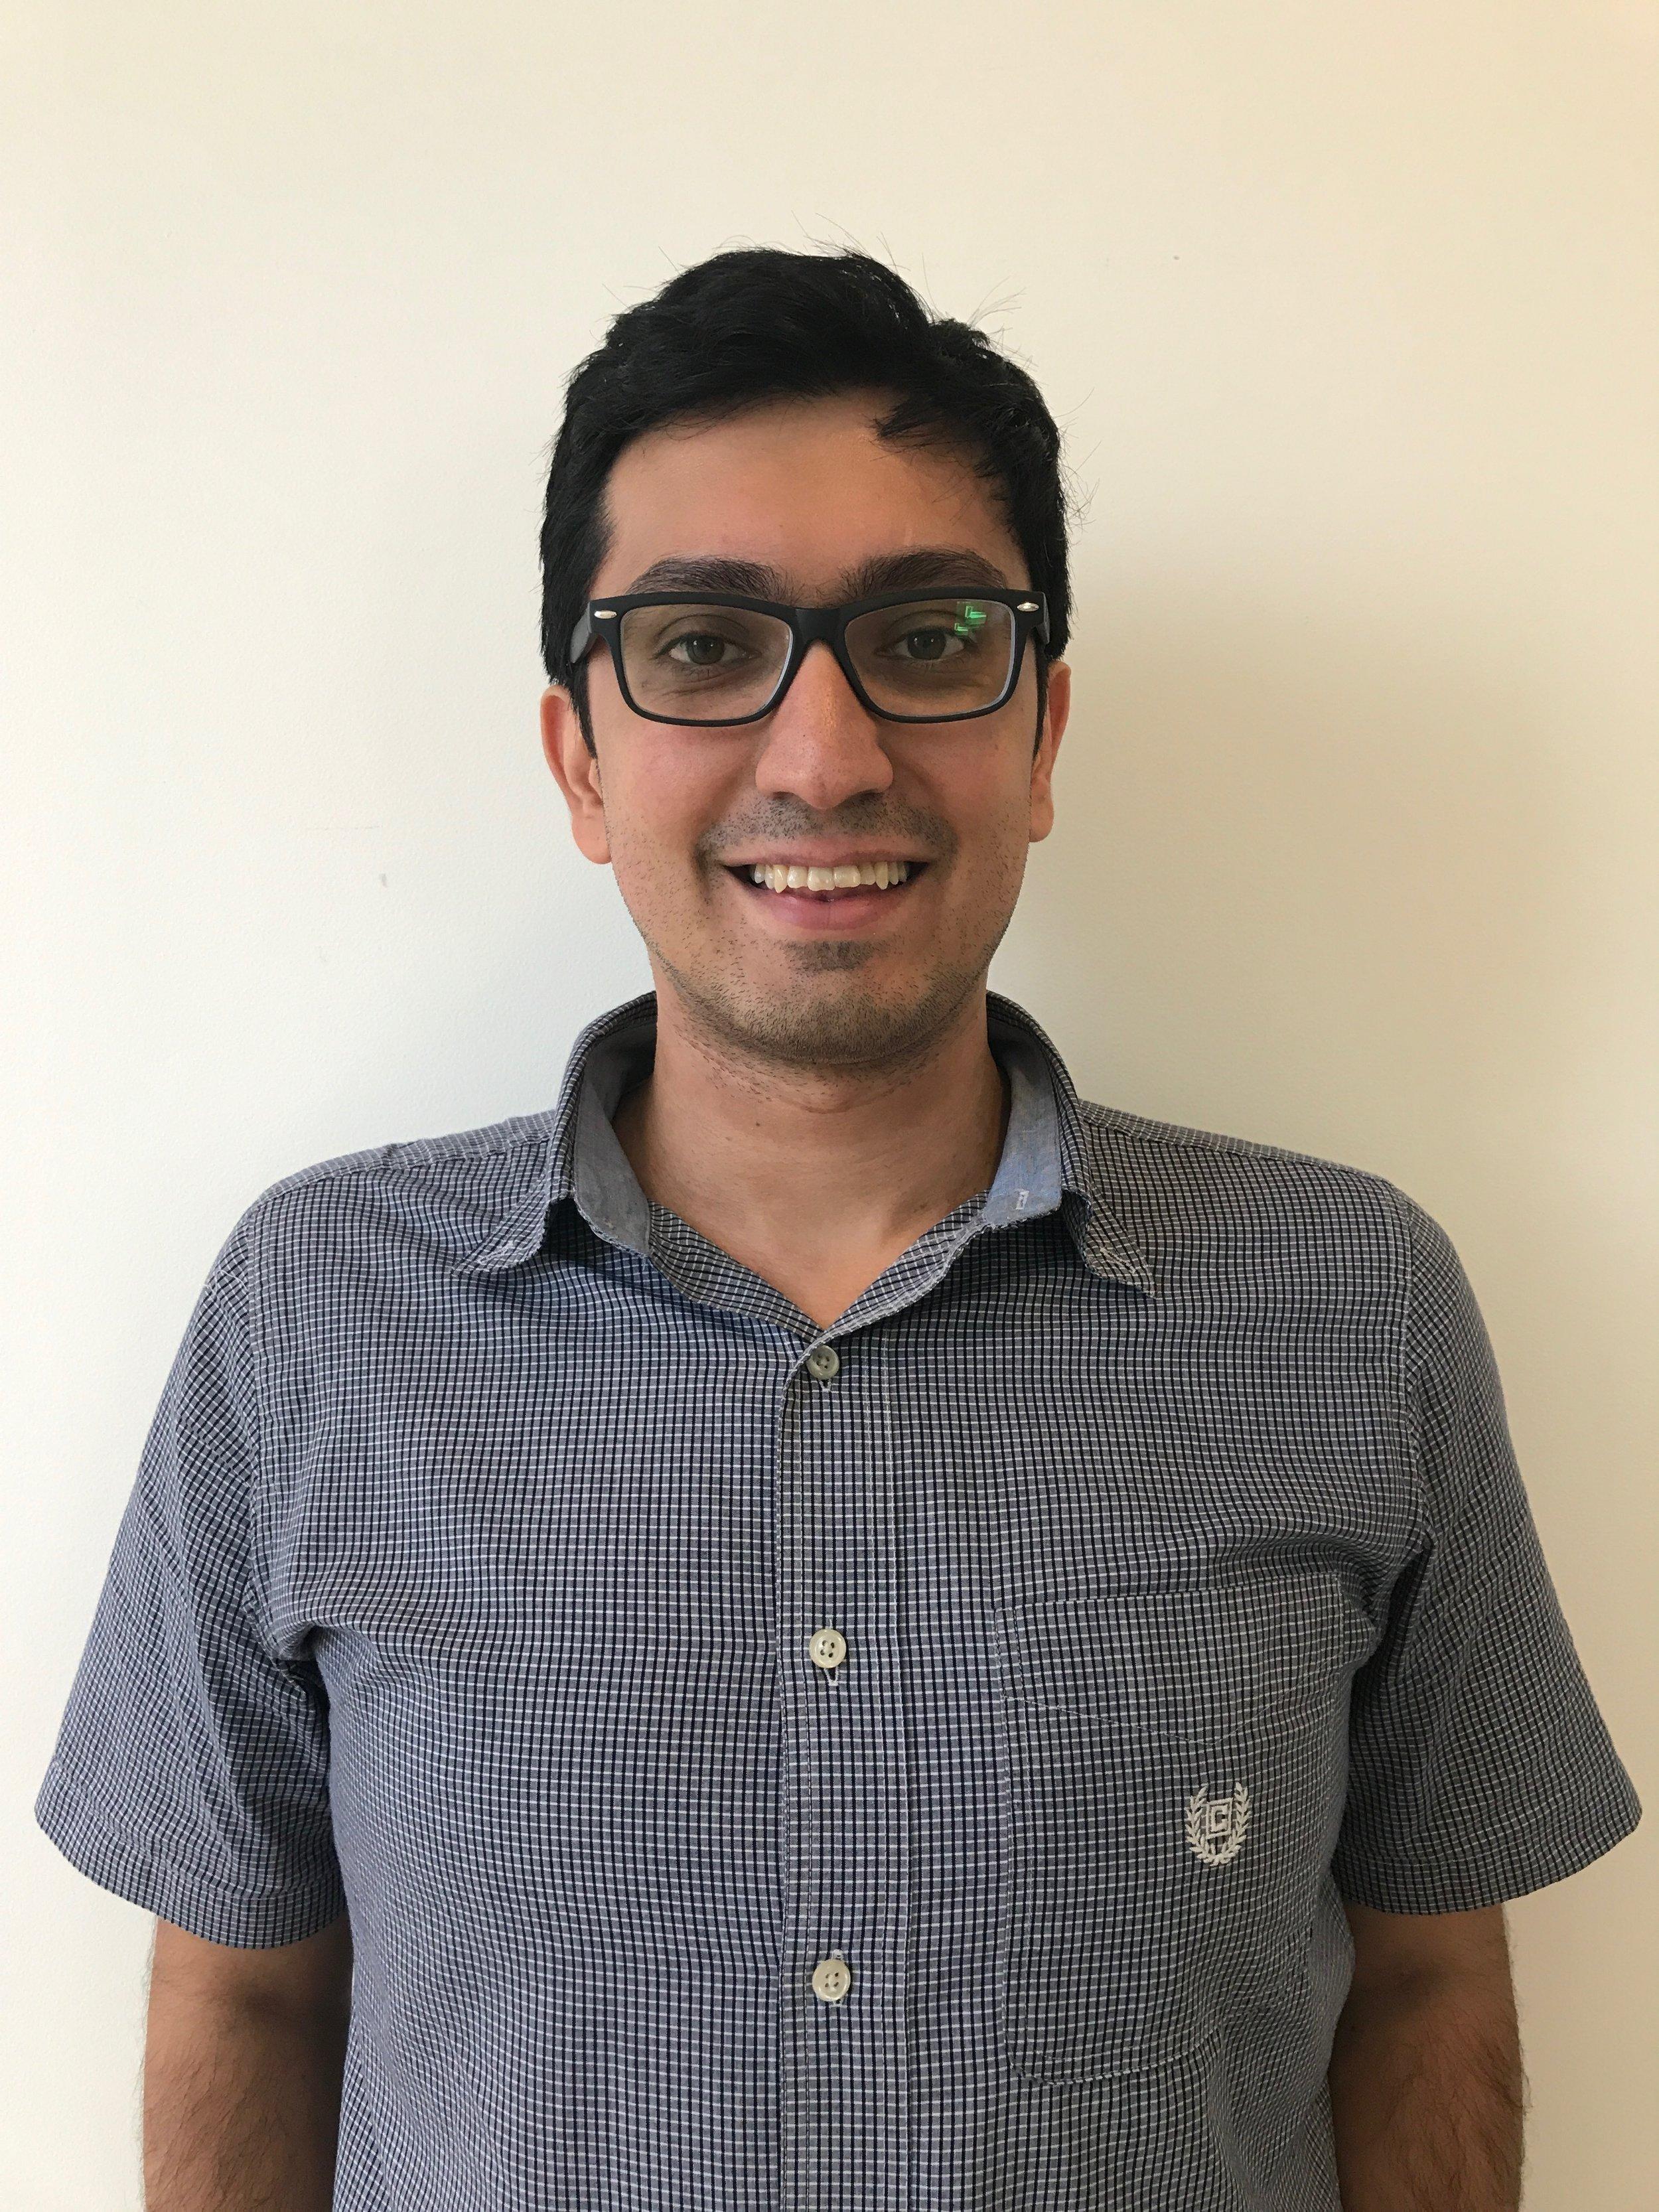 Soroush Vosoughi   Social Machines, MIT Media Lab || Harvard Berkman